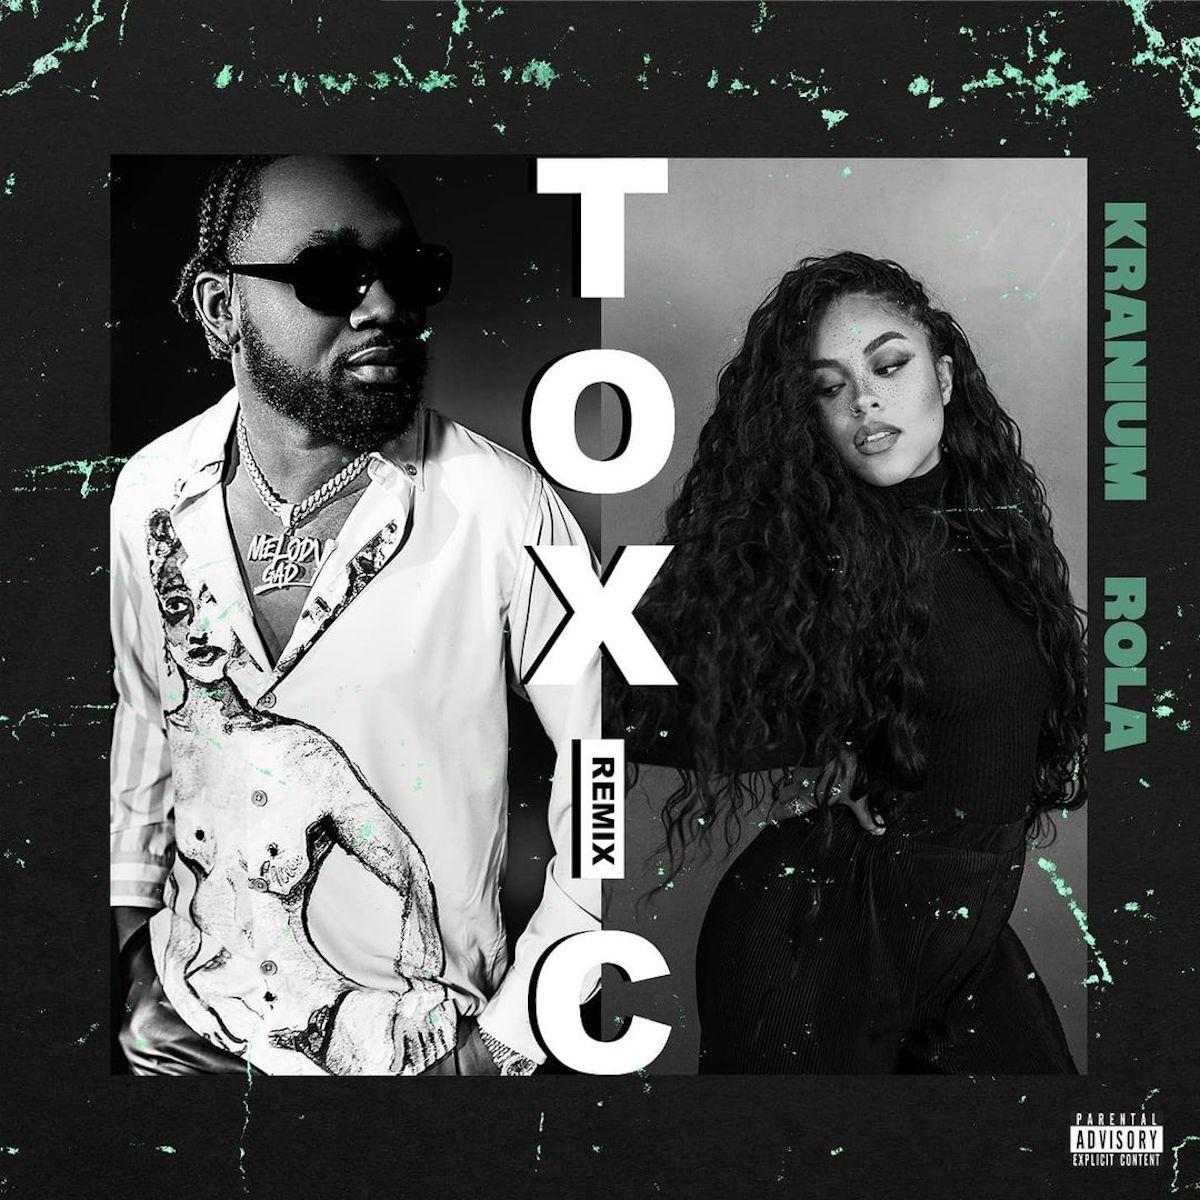 Kranium – Toxic (Remix) Ft. Rola mp3 download